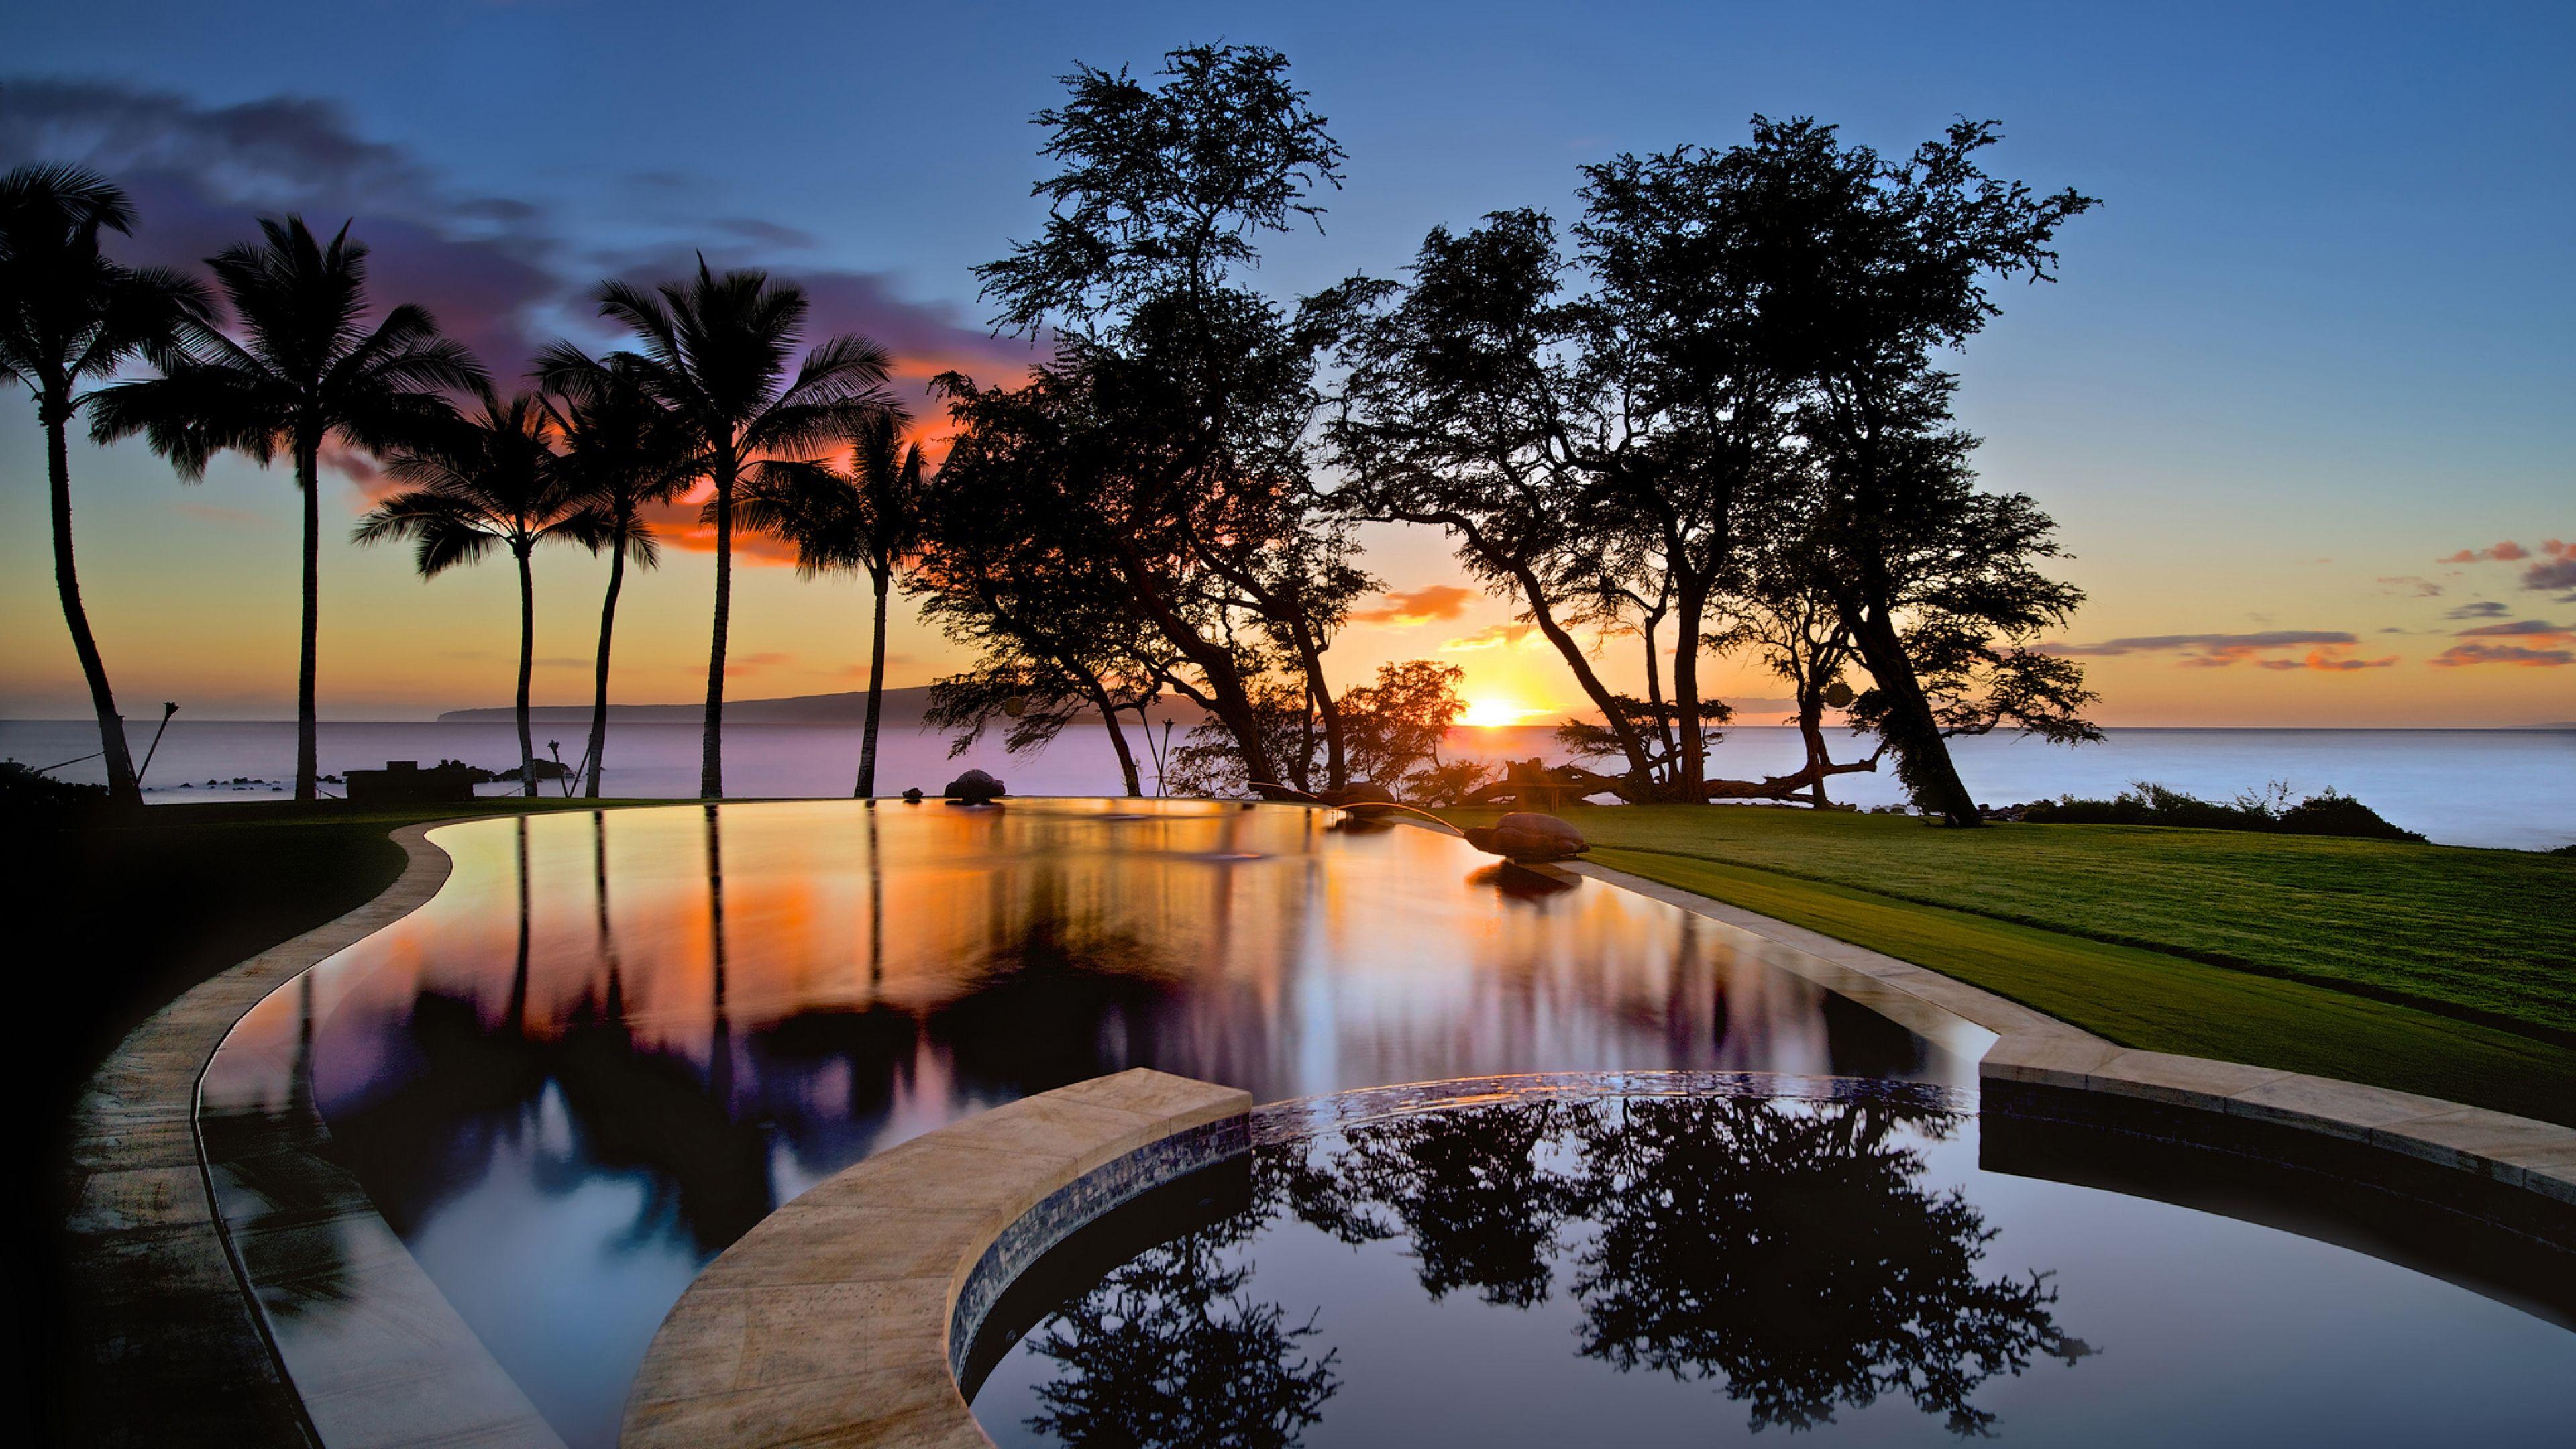 3840x2160 Wallpaper usa, hawaii, maui, swimming pool